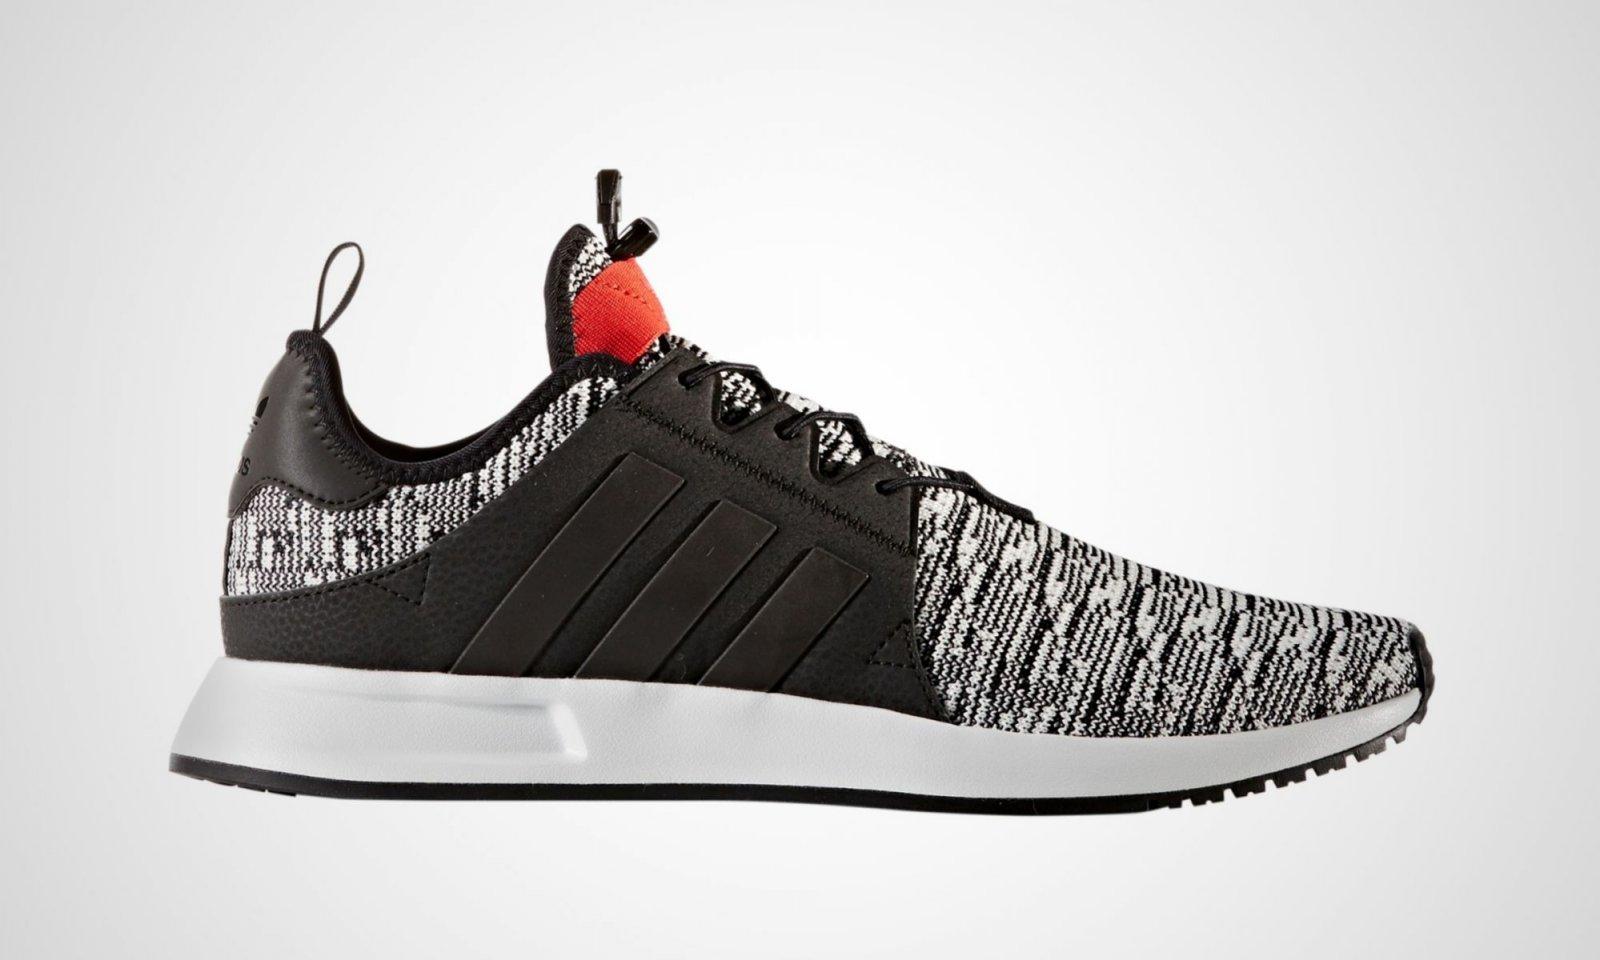 Shoe 5 Adidas 09'Ebay X By9262 Uk6 Sneaker Men's 11 Originals plr rdoQeCWxB